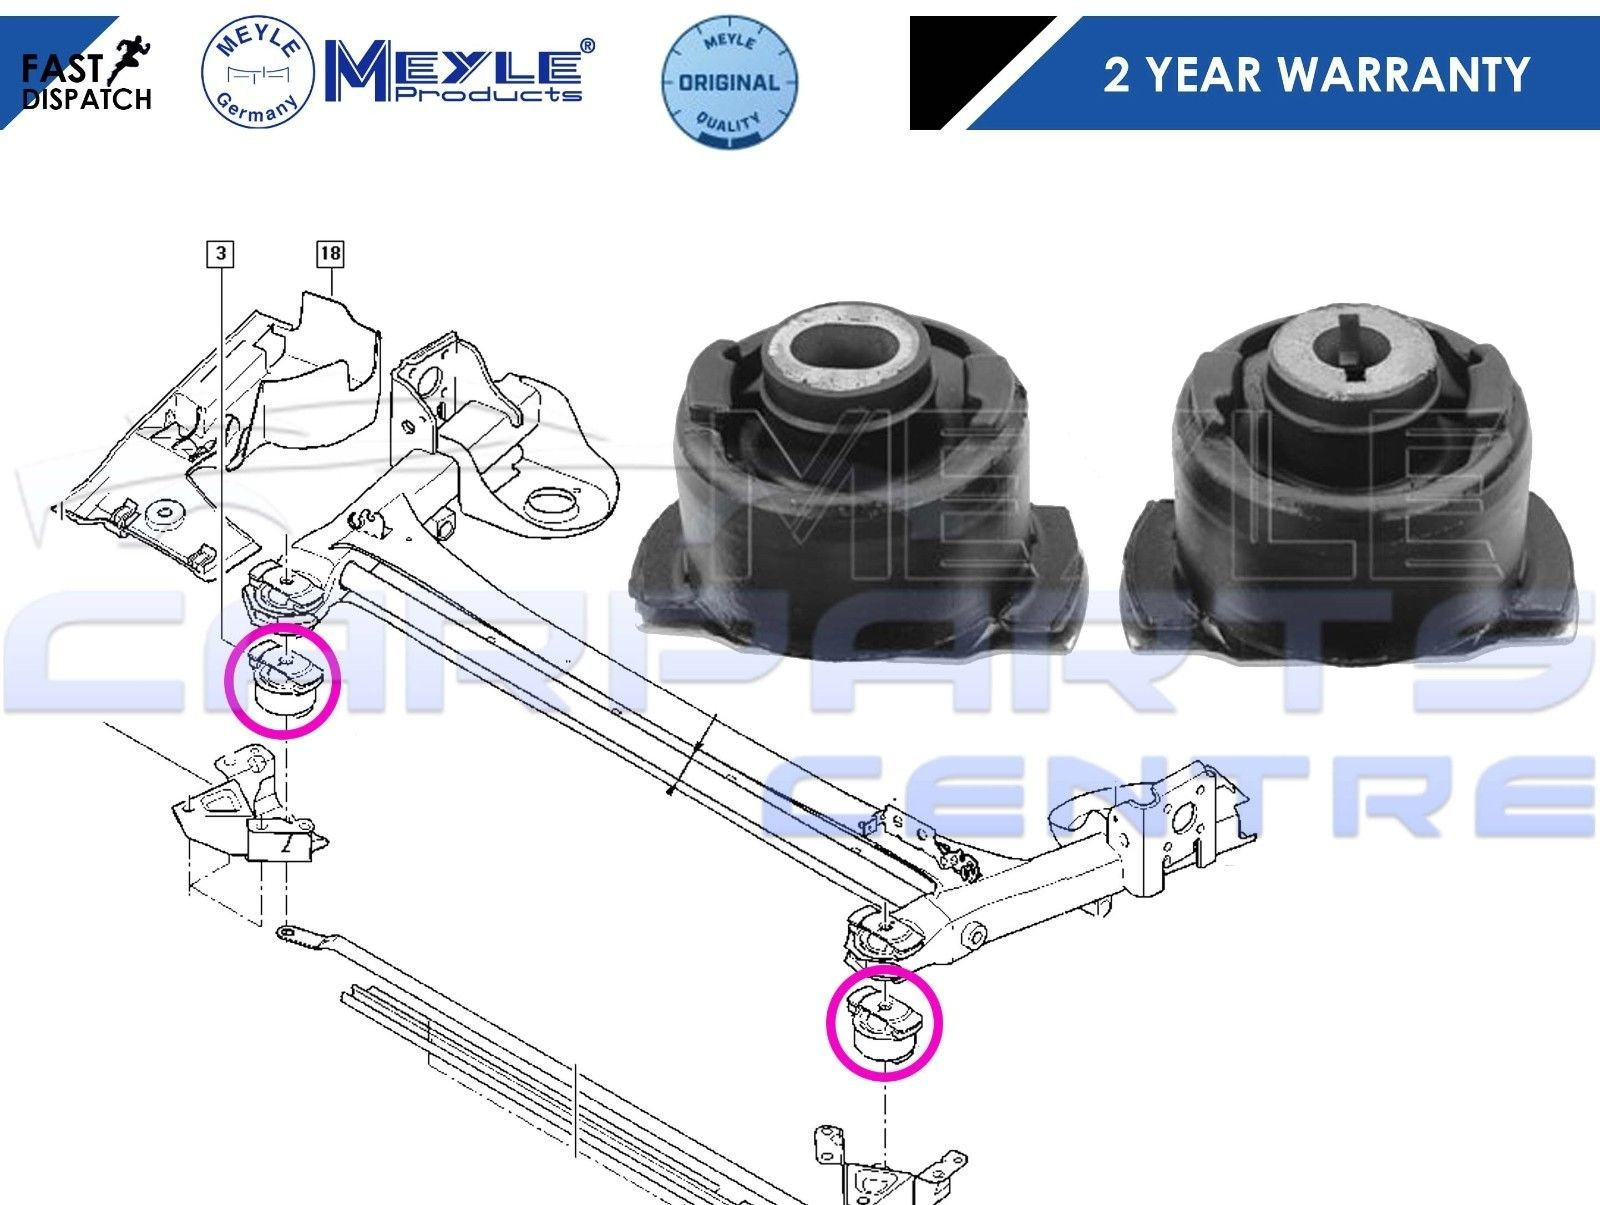 Renault Megane Engine Diagram For Renault Laguna Mk2 Sport Tourer 01 Rear Axle Mounting Subframe